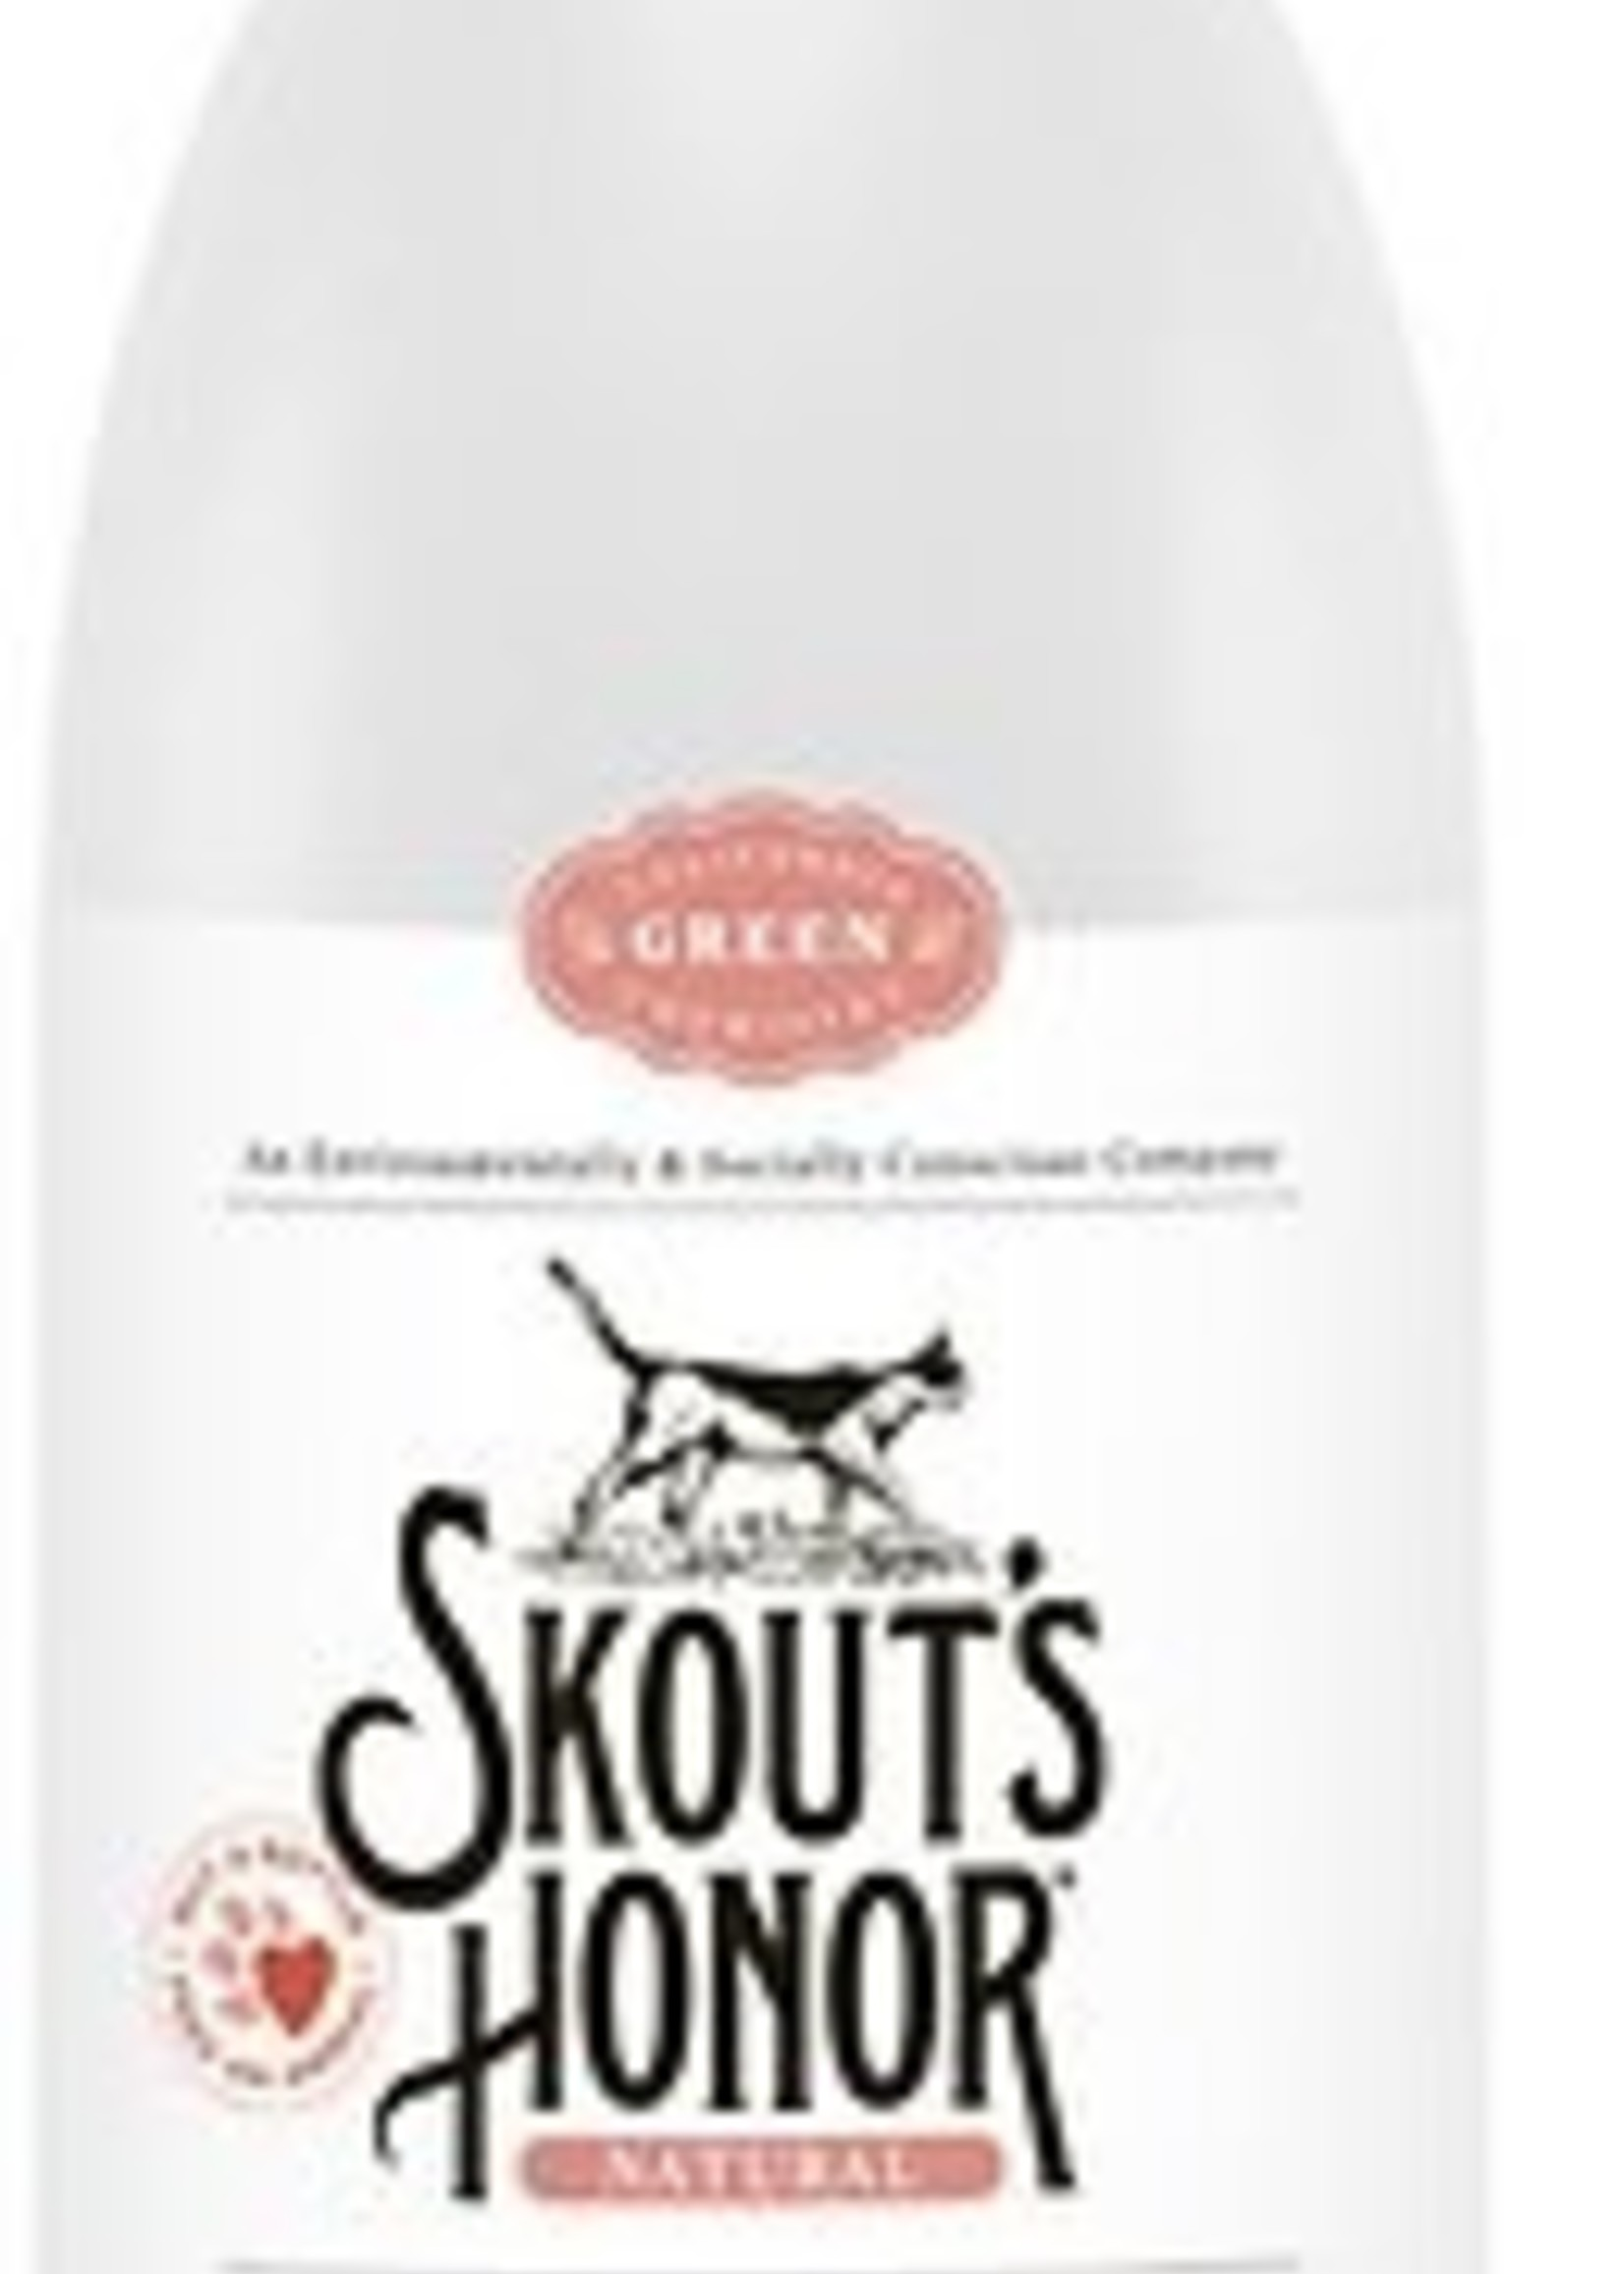 SKOUT'S HONOR Skouts Super Urine & Odor Remover 35 oz